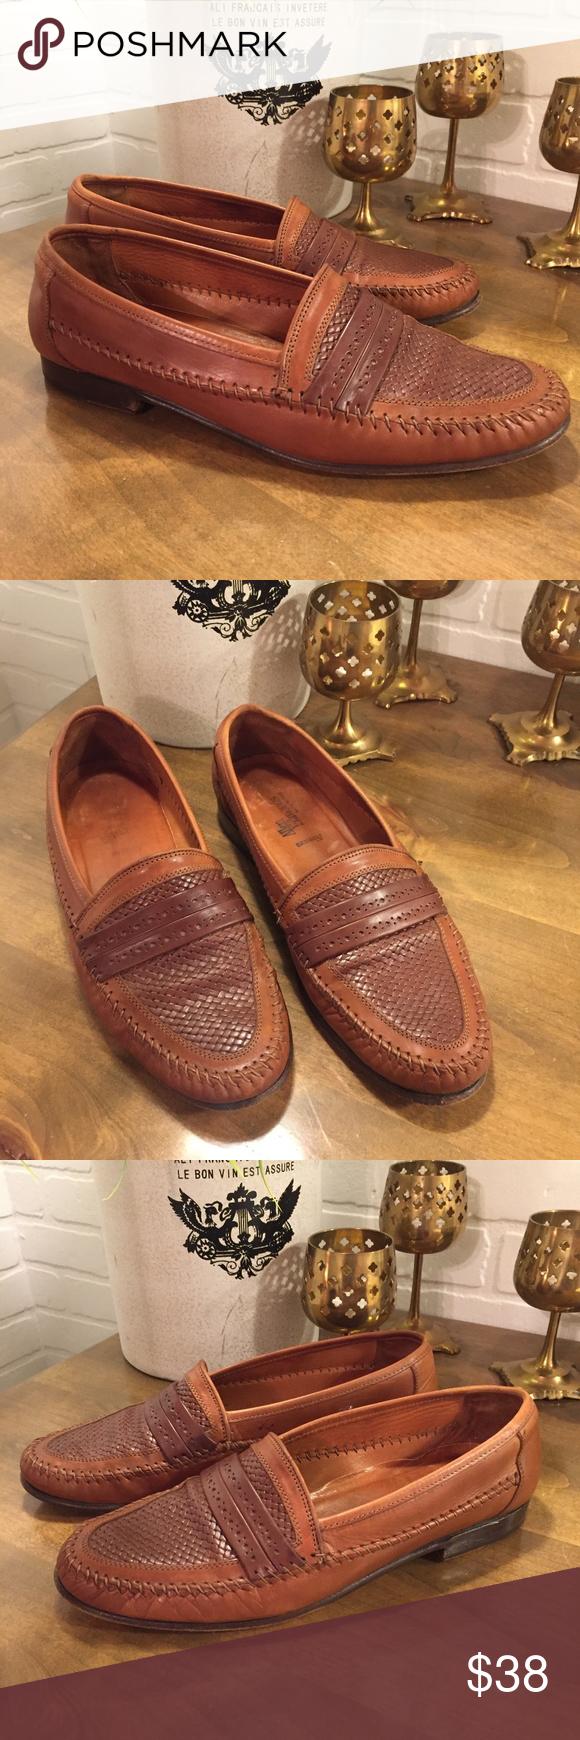 Allen Edmonds Novara Calf Leather Loafers Men 105 Brand Allen